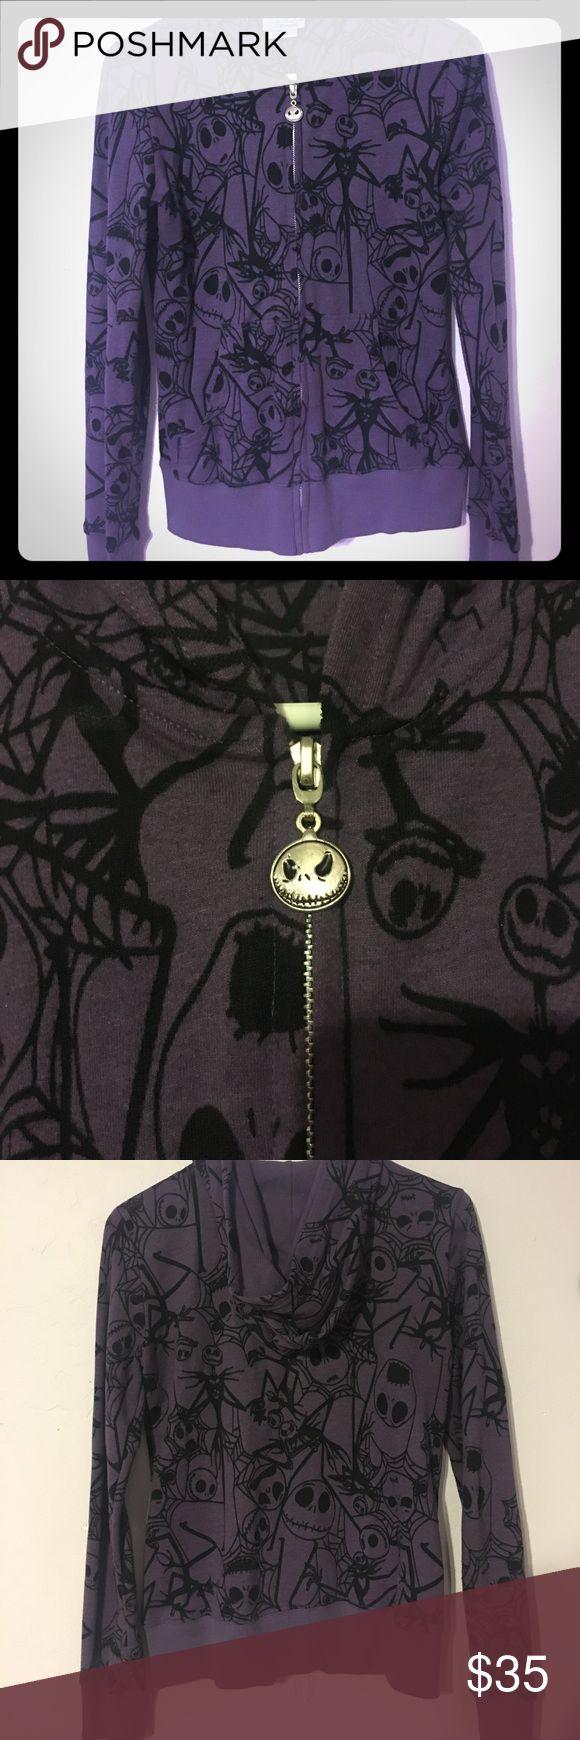 Rare Jack Skellington Hoodie! Super soft and spooky Jack Skellington Nightmare Before Christmas hoodie! Perfect condition! This hoodie cannot be bought at Disneyland anymore. Disney Tops Sweatshirts & Hoodies